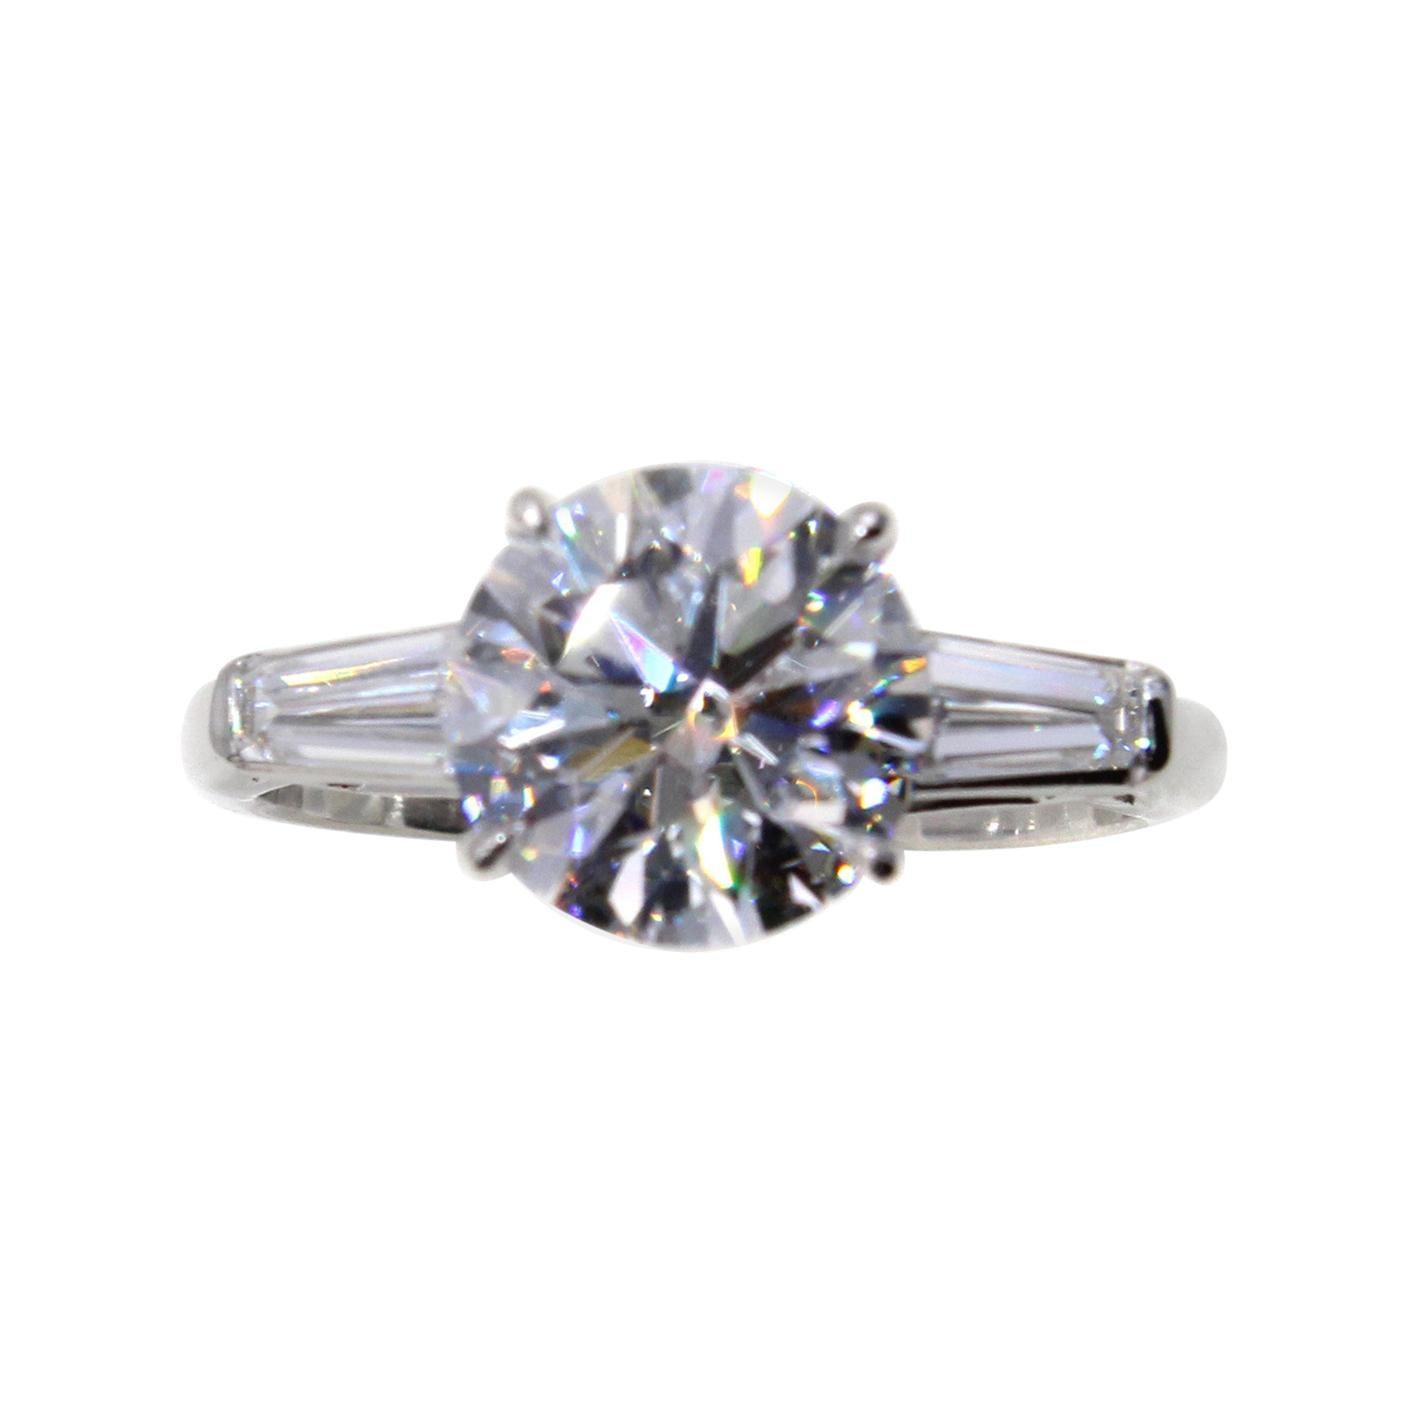 2.56 Carat D IF GIA Certified Diamond Platinum Engagement Ring